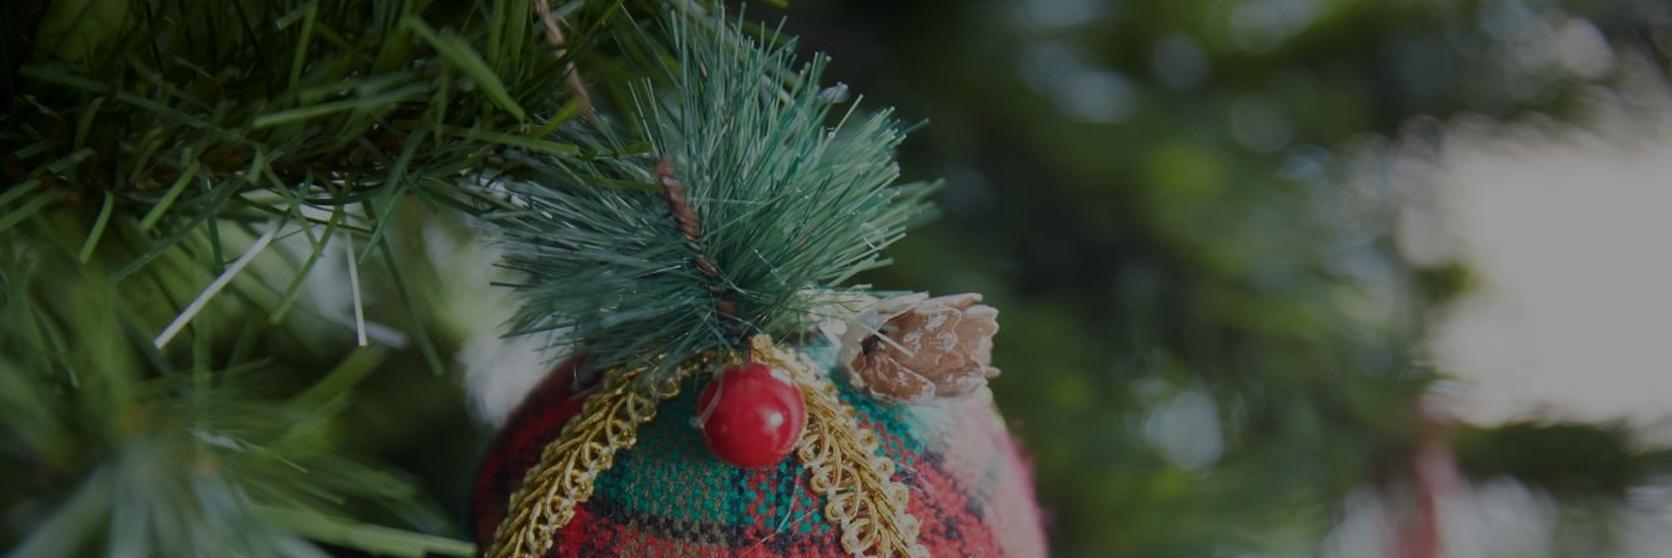 Diy-christmas-tree-decorations-1